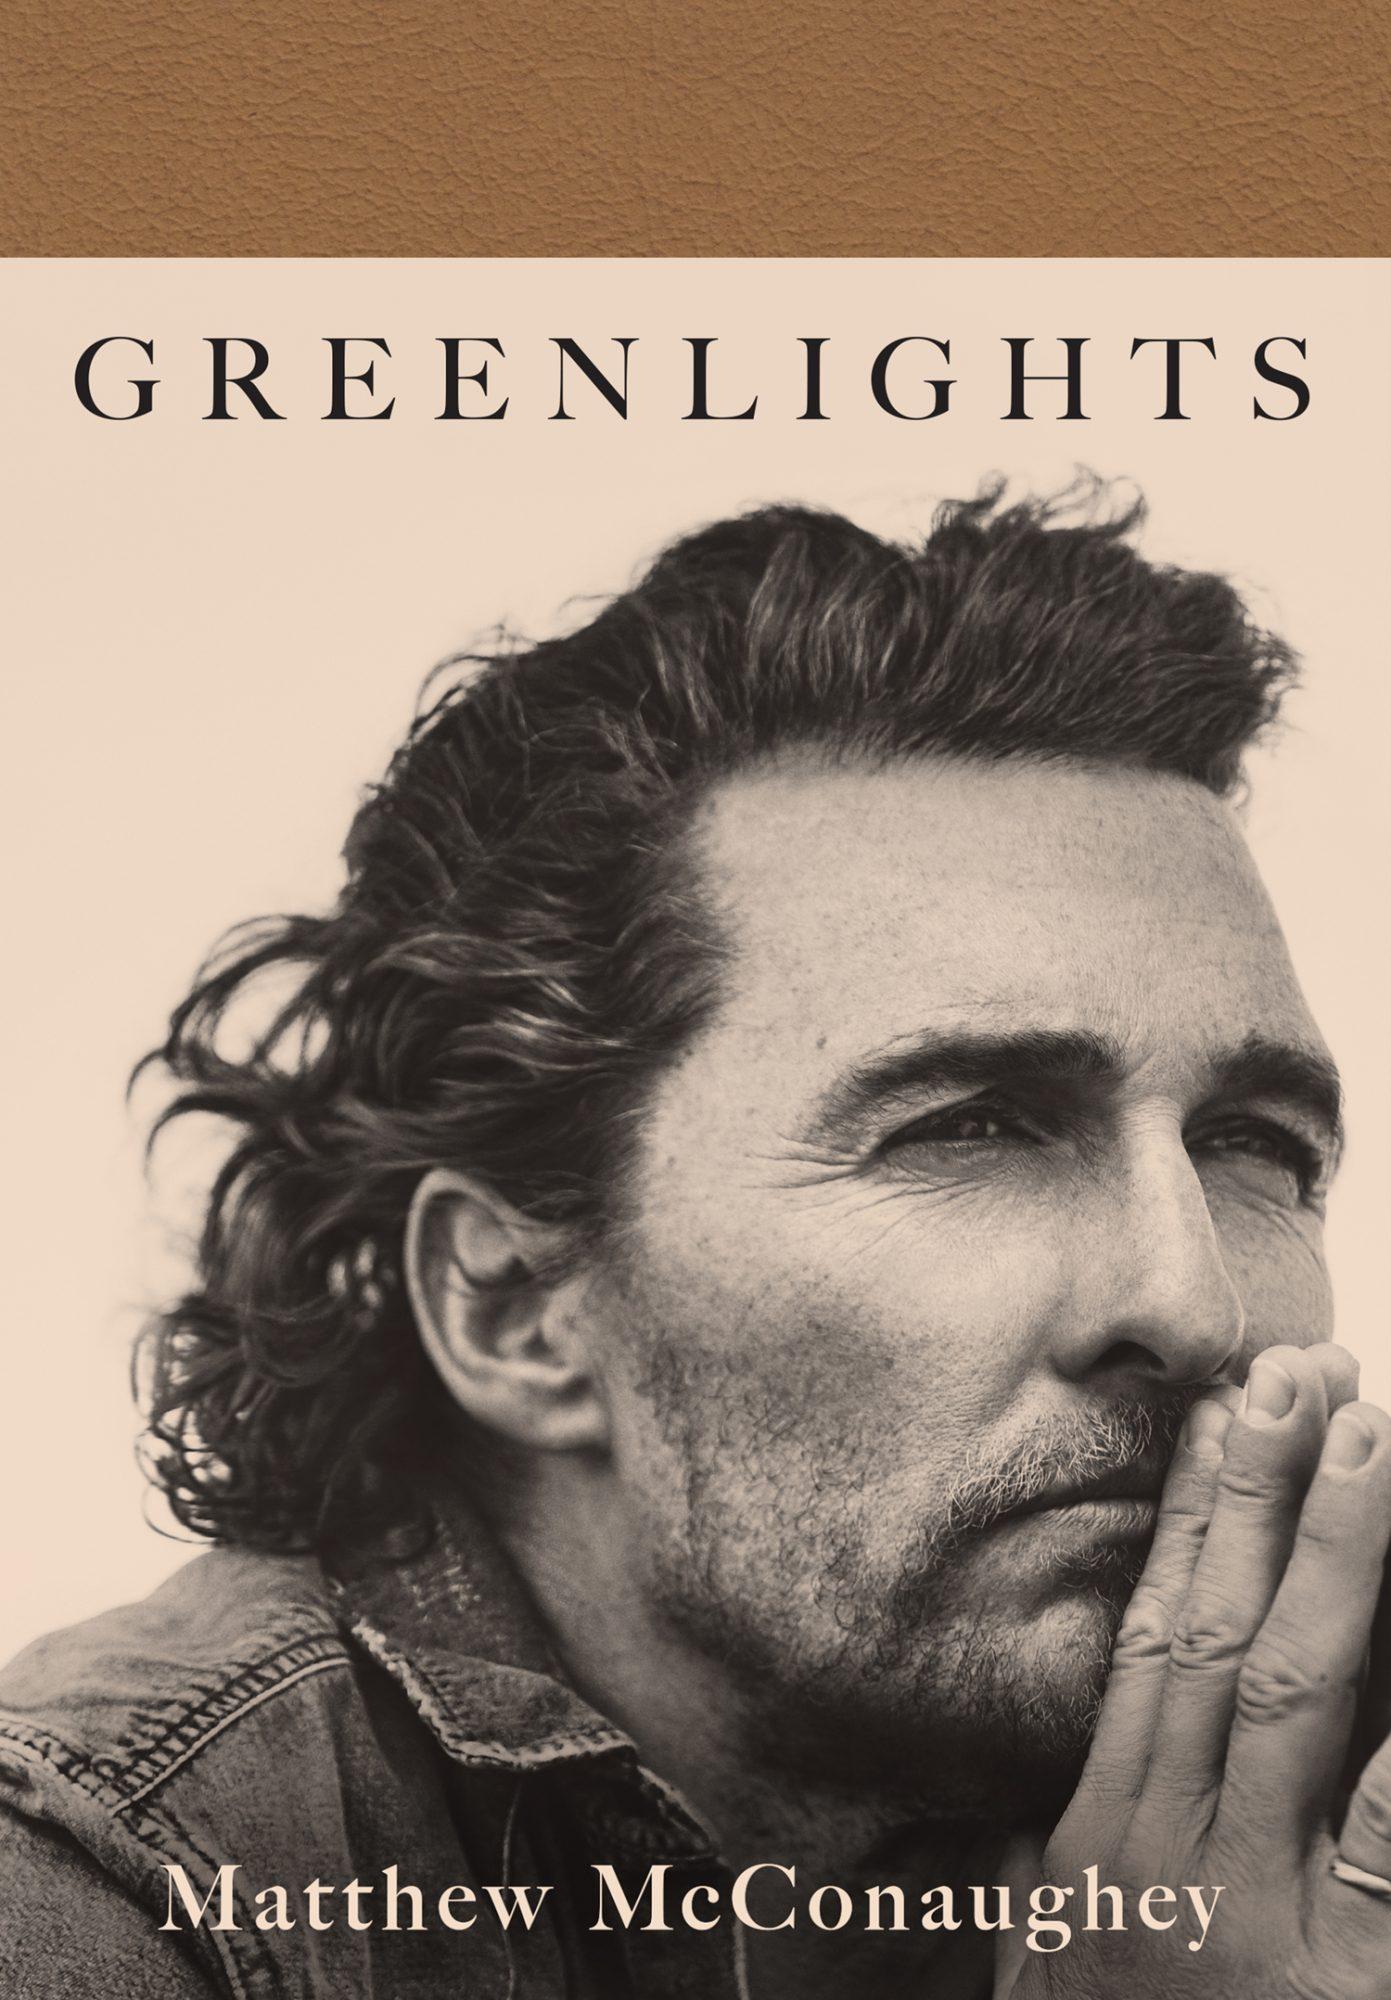 Greenlights by Matthew McConaughey